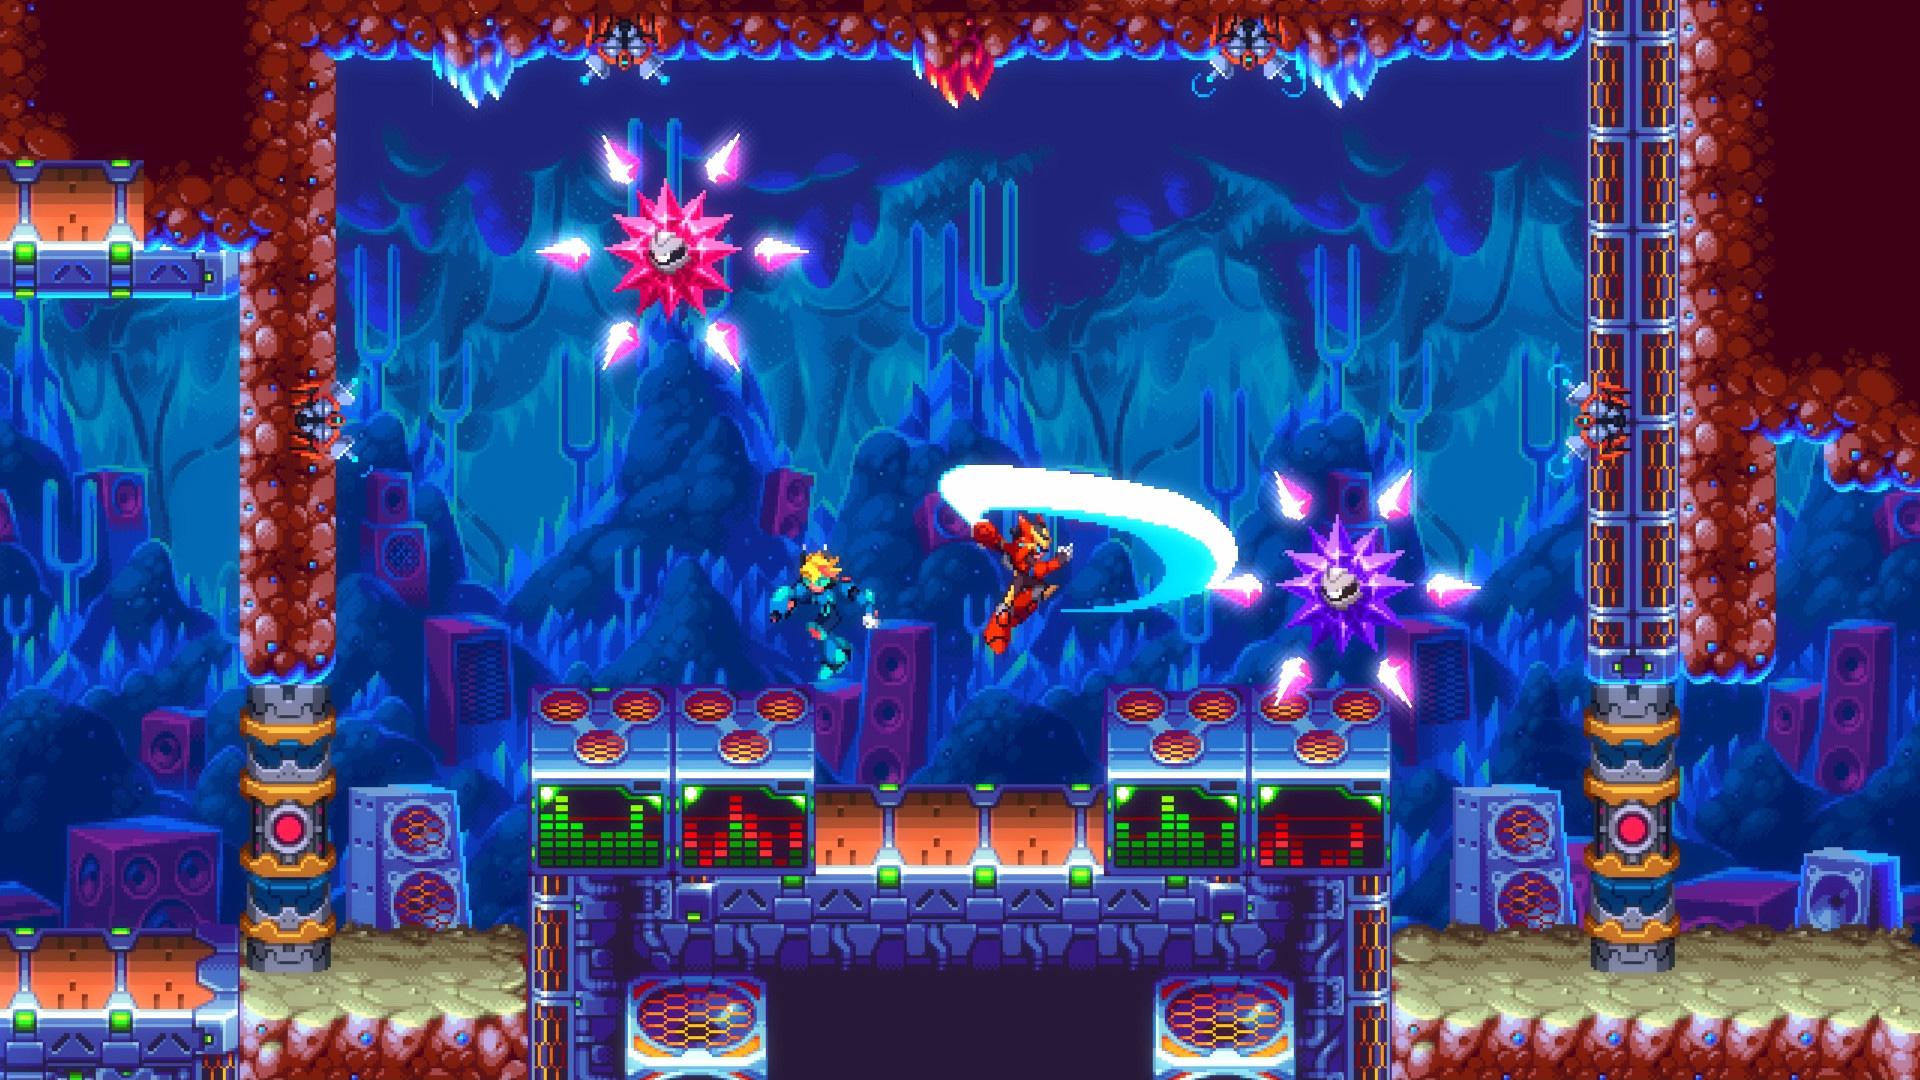 30XX is a stylish roguelike take on Mega Man X and Zero screenshot